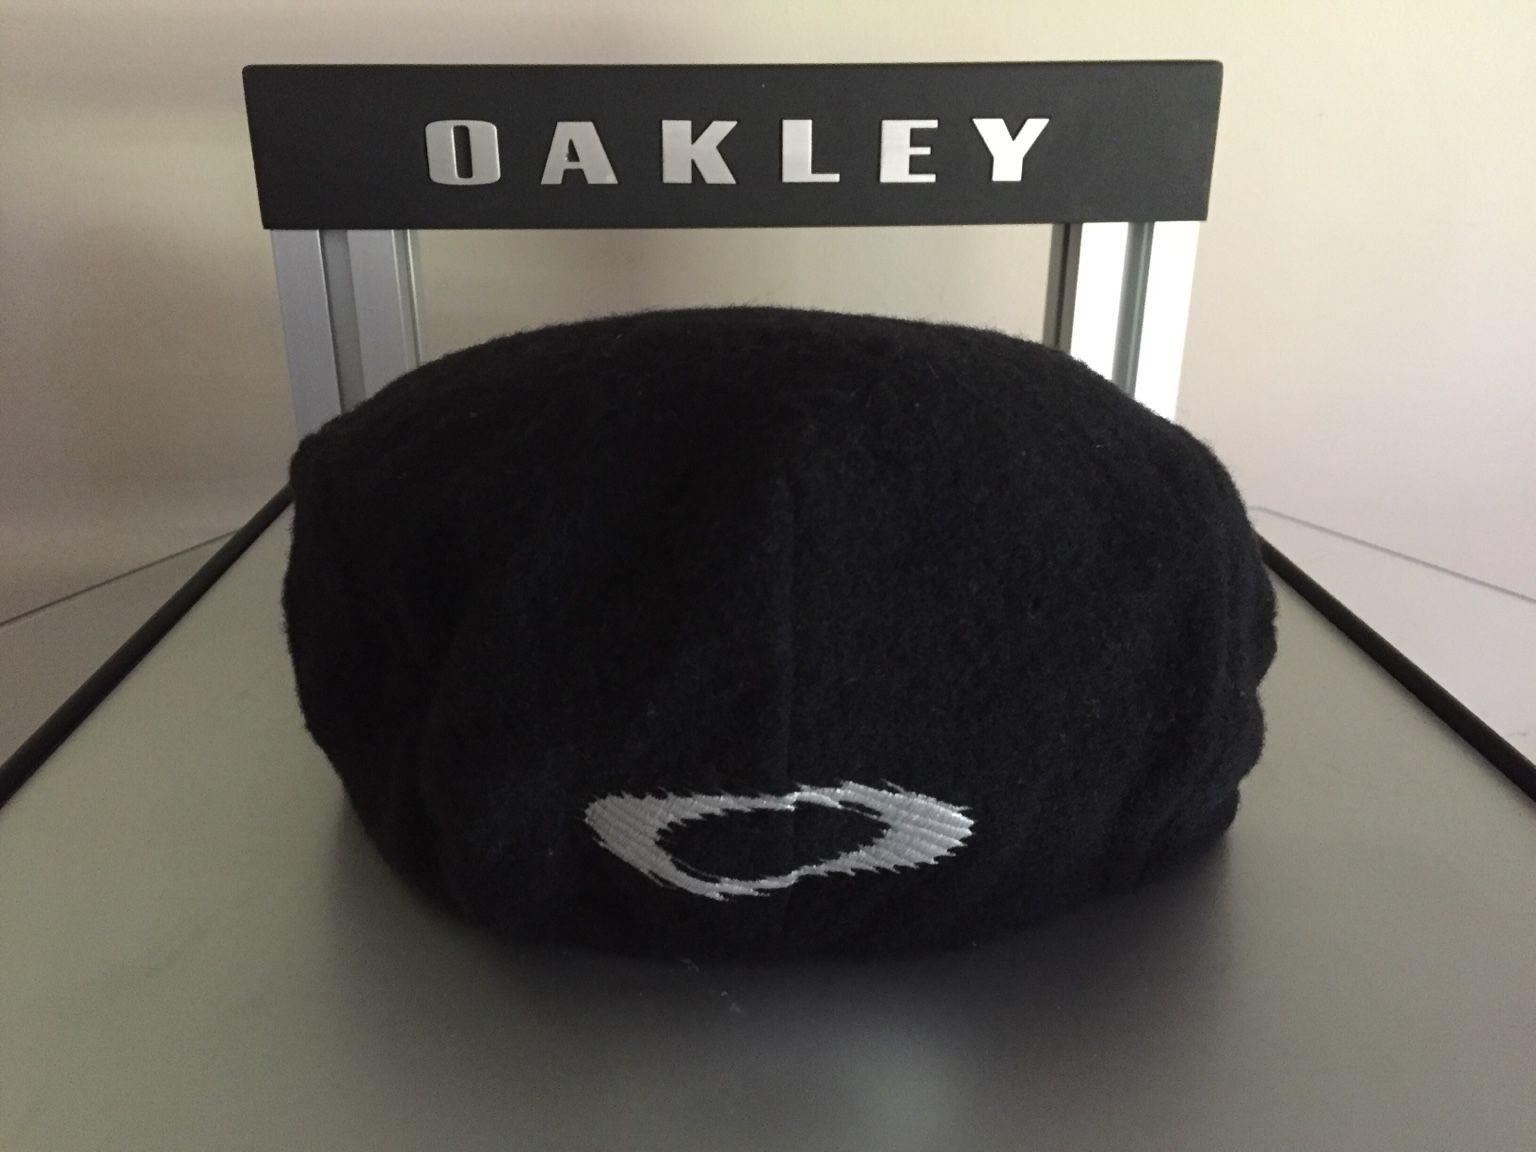 WTS: Oakley Static O Beret - 536acda8c8162009d805afecc387ad49.jpg